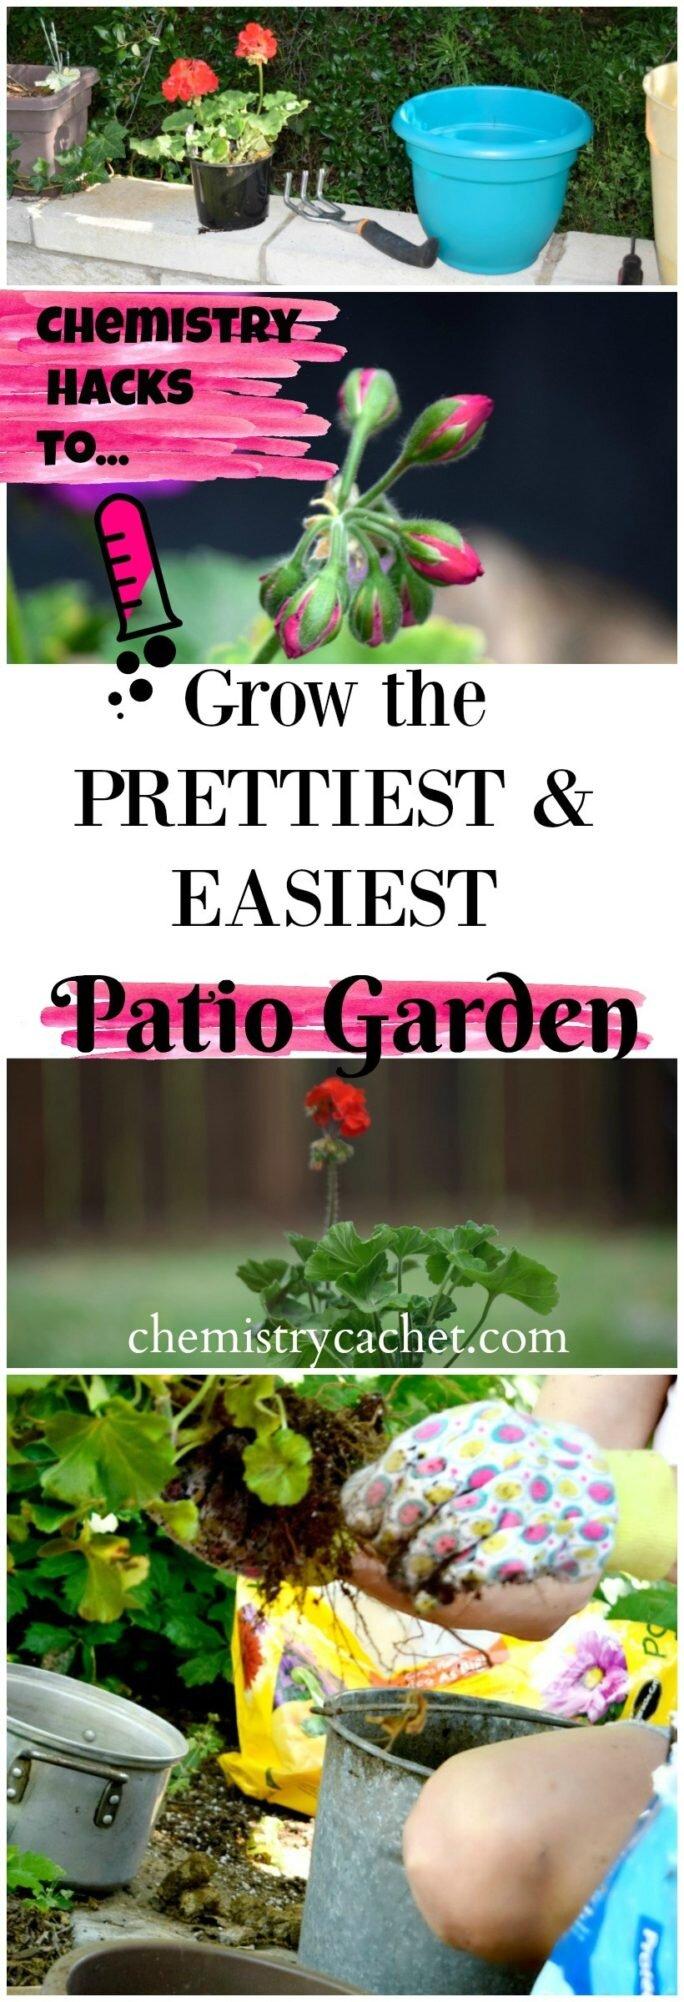 Hacks for a simple patio garden!